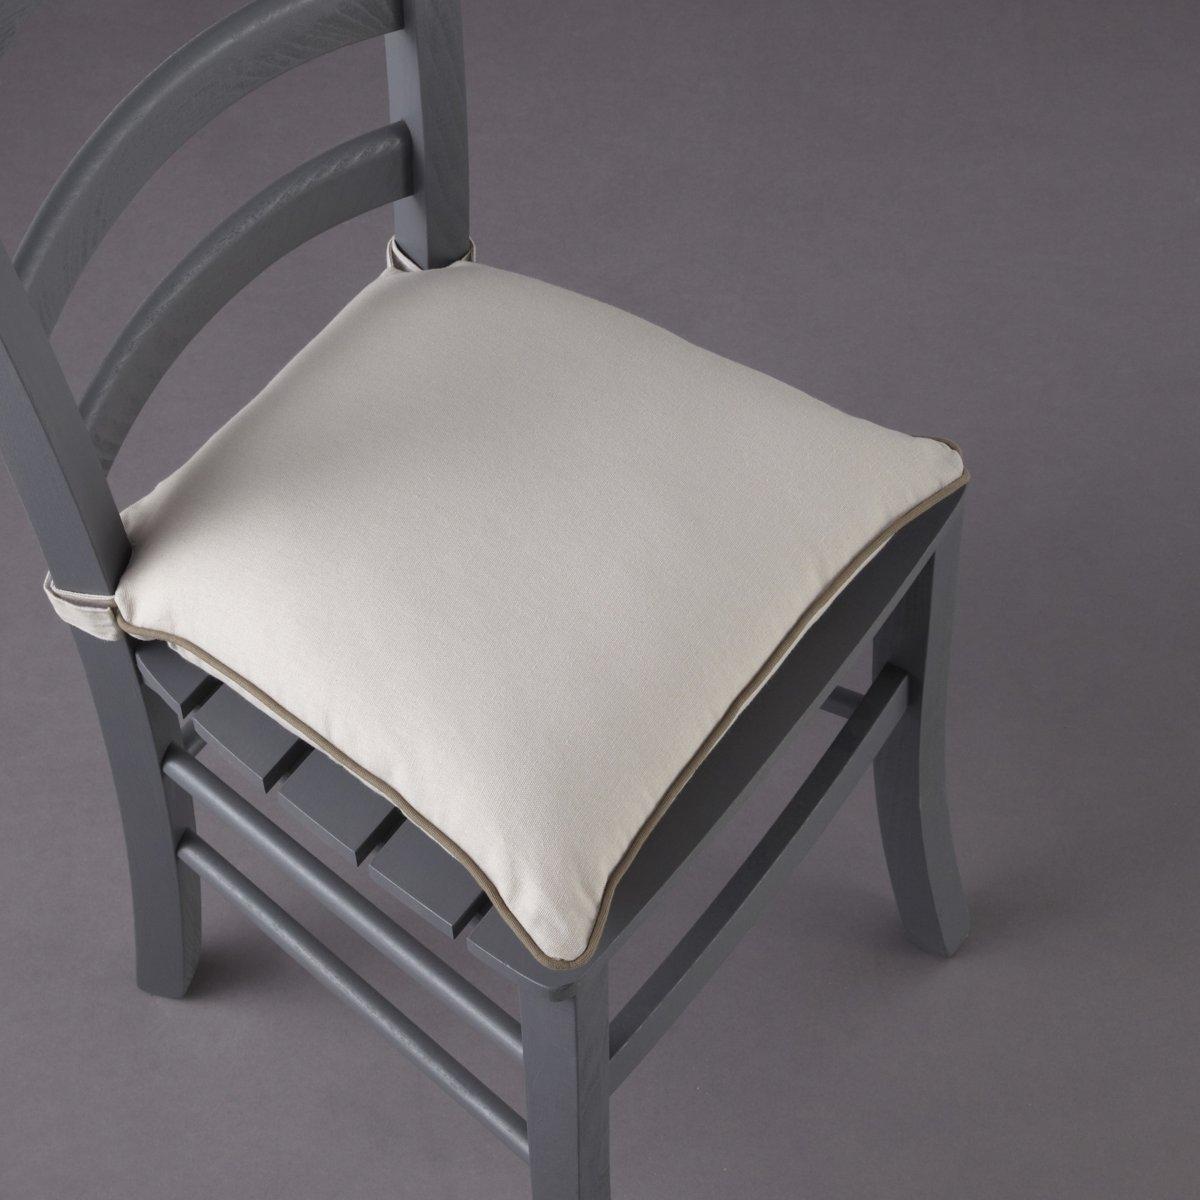 Подушка для стула, BRIDGY от La Redoute